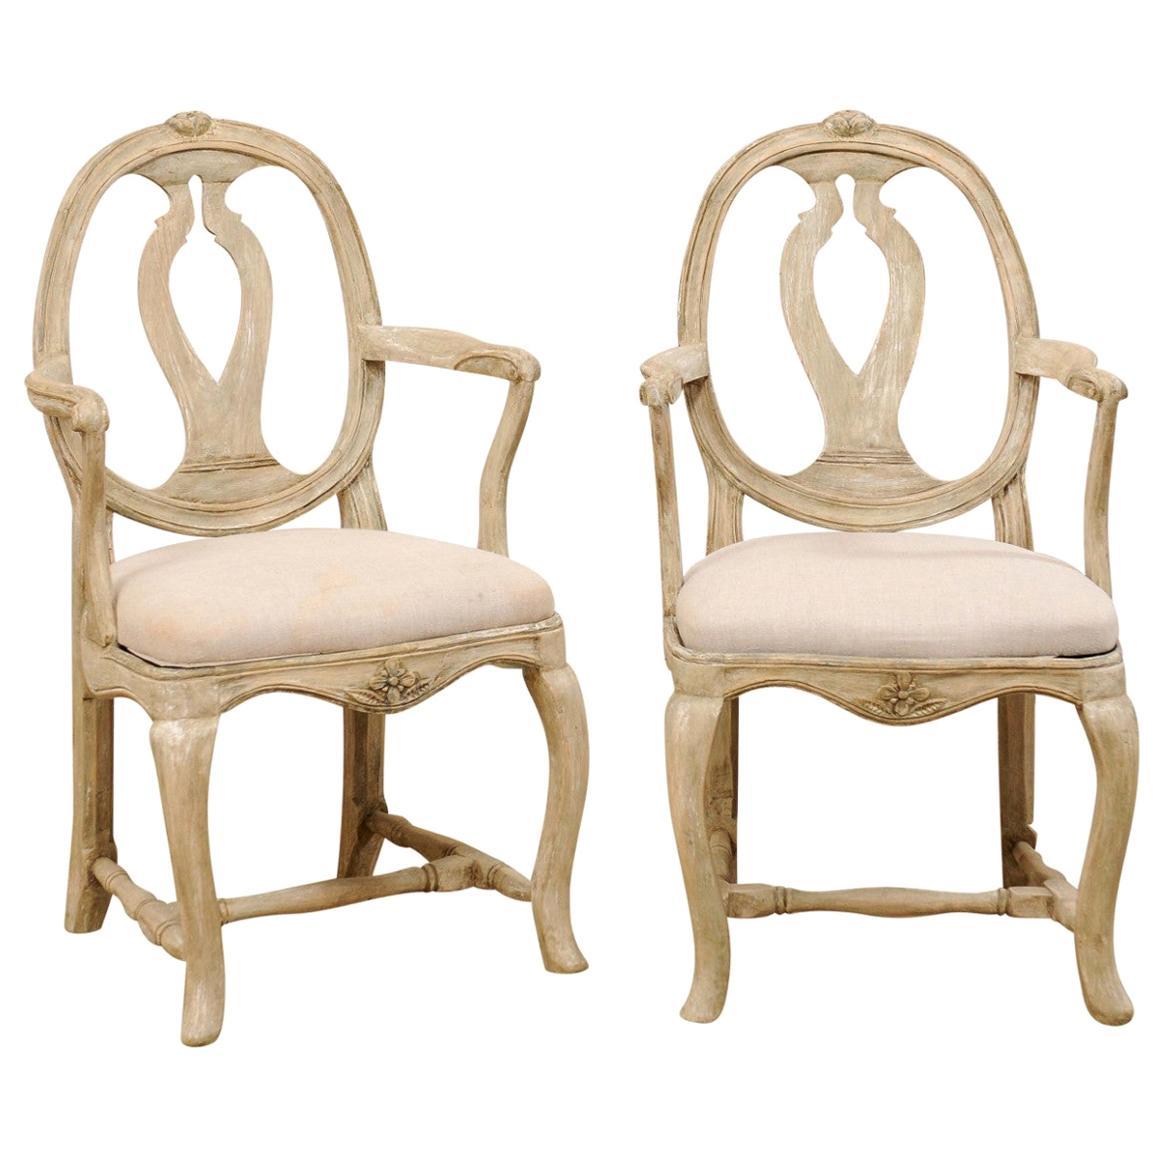 "Pair of Swedish Gustavian ""Svenska Modellen"" Wood Armchairs, Early 19th Century"